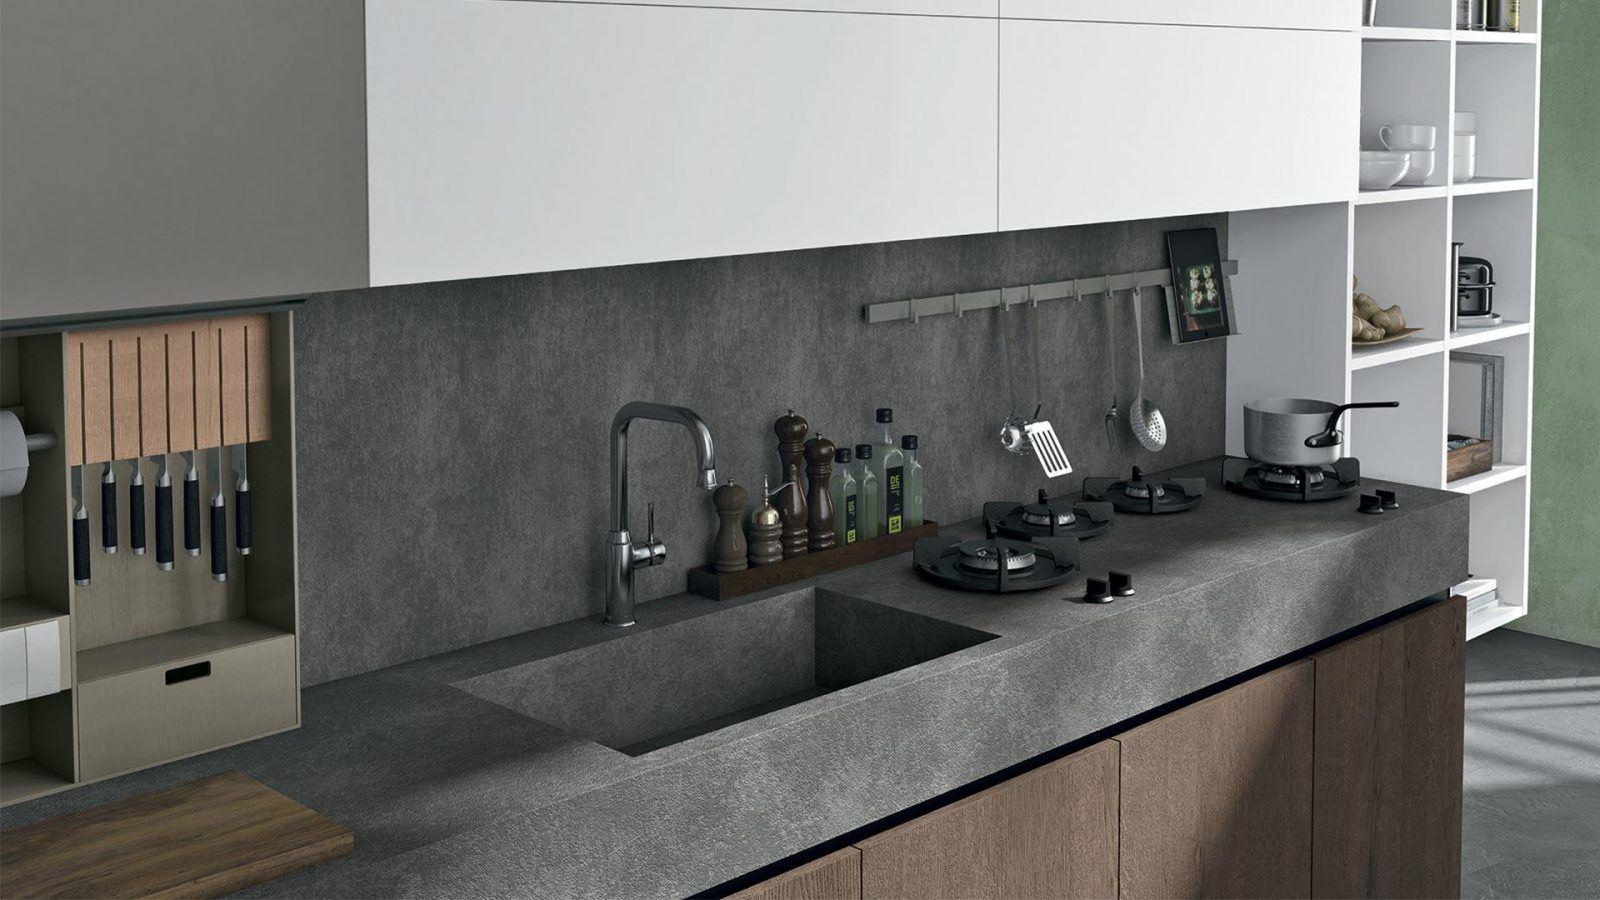 Cucine di design moderno e contemporaneo a padova - Cucine da design ...